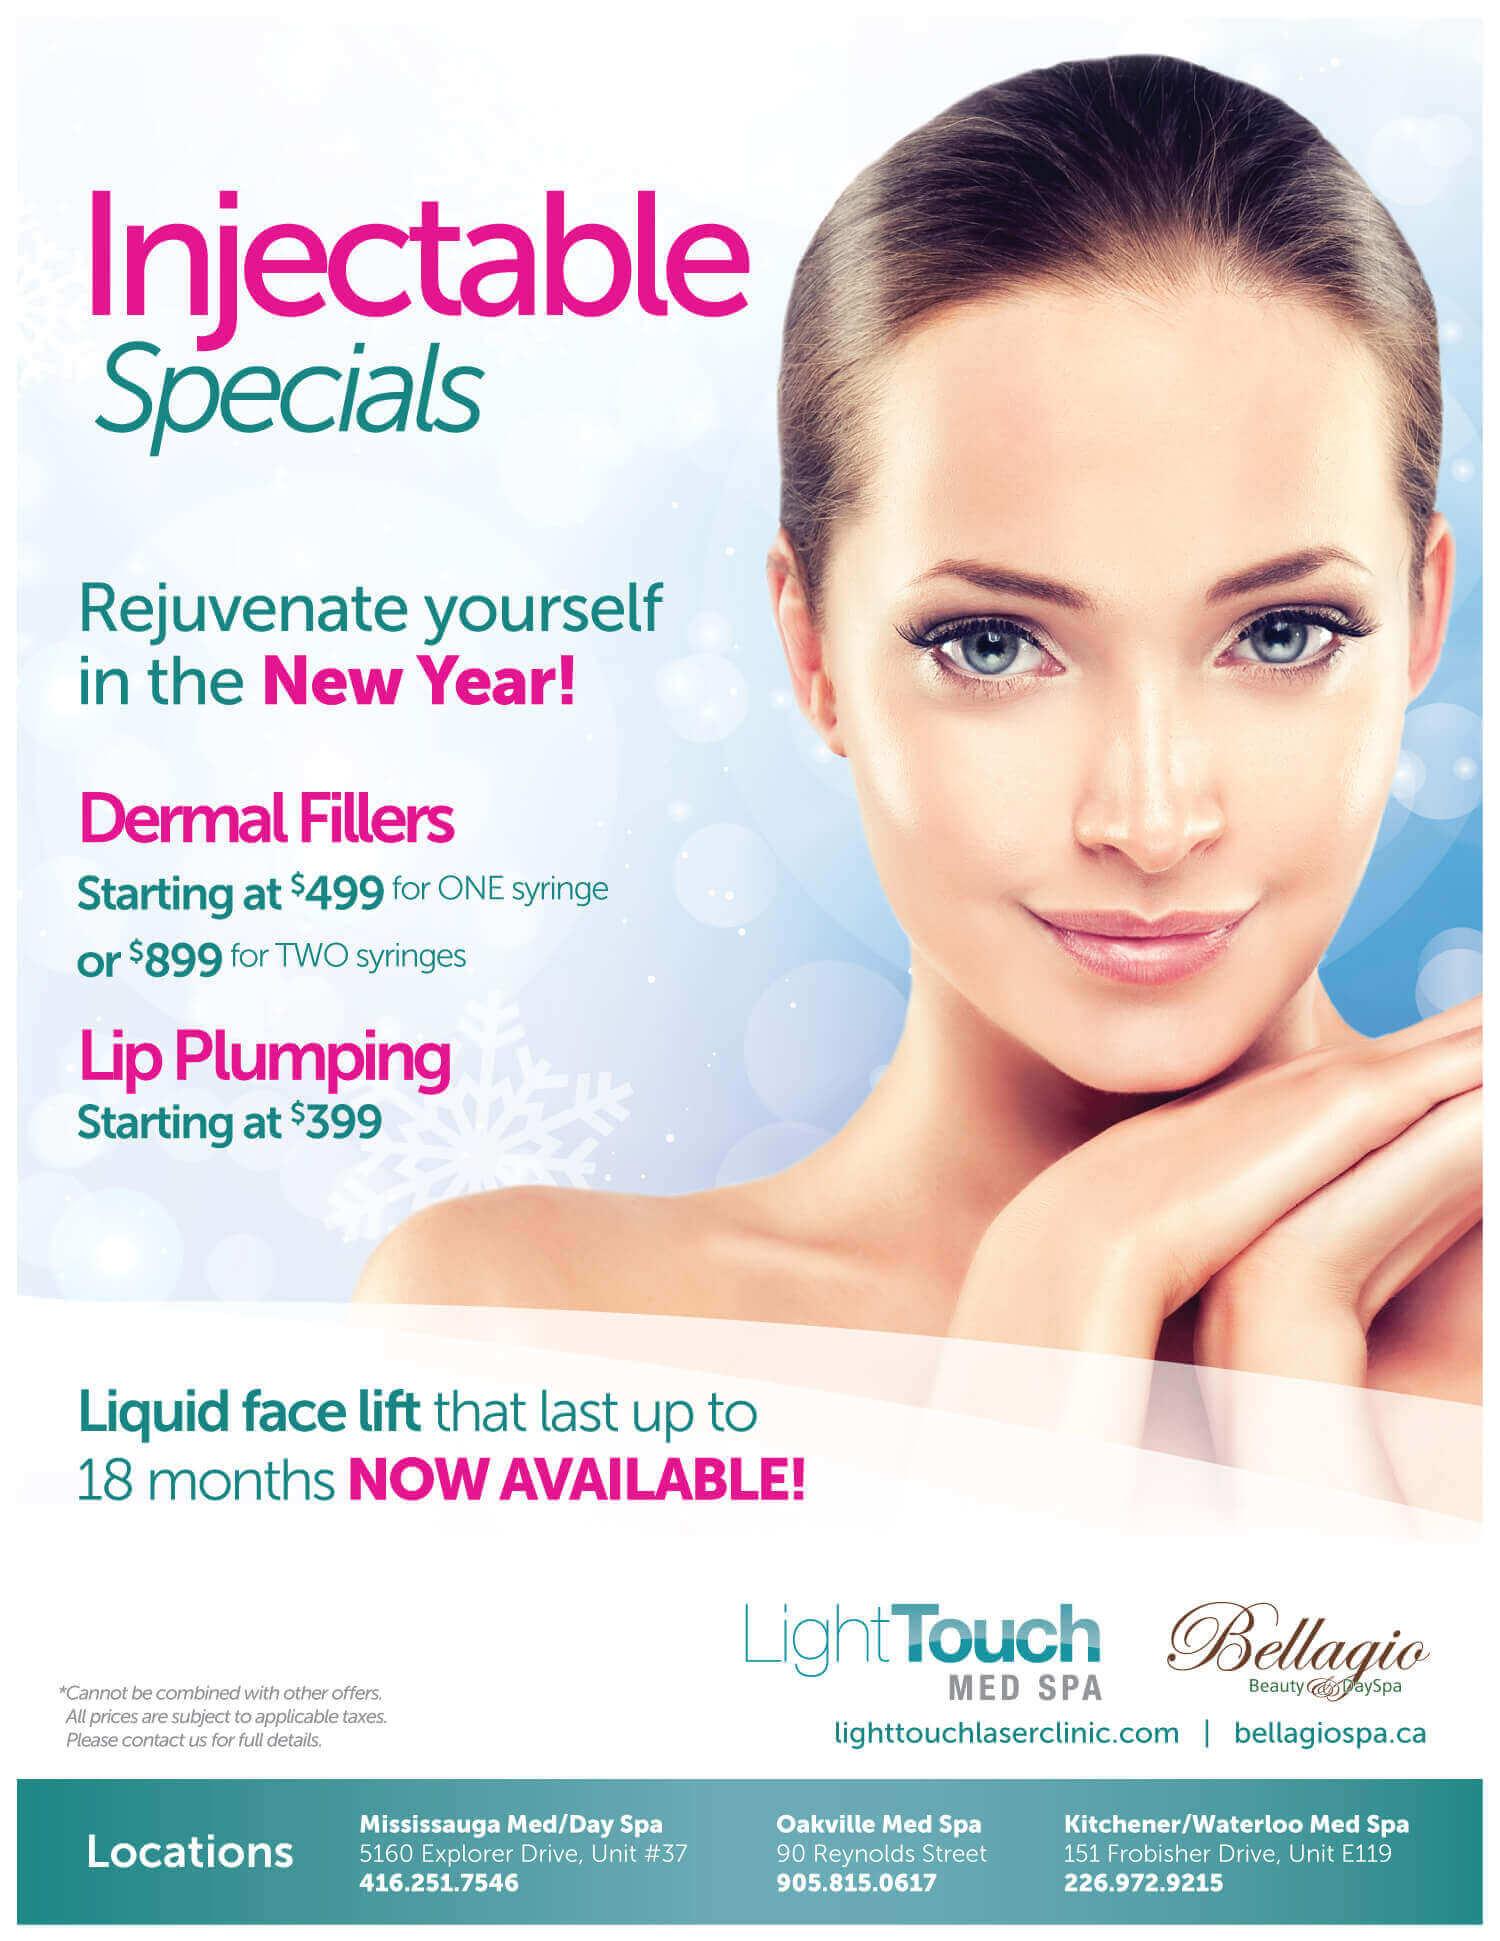 lighttouch_injectables_flyer_jan0617_v1